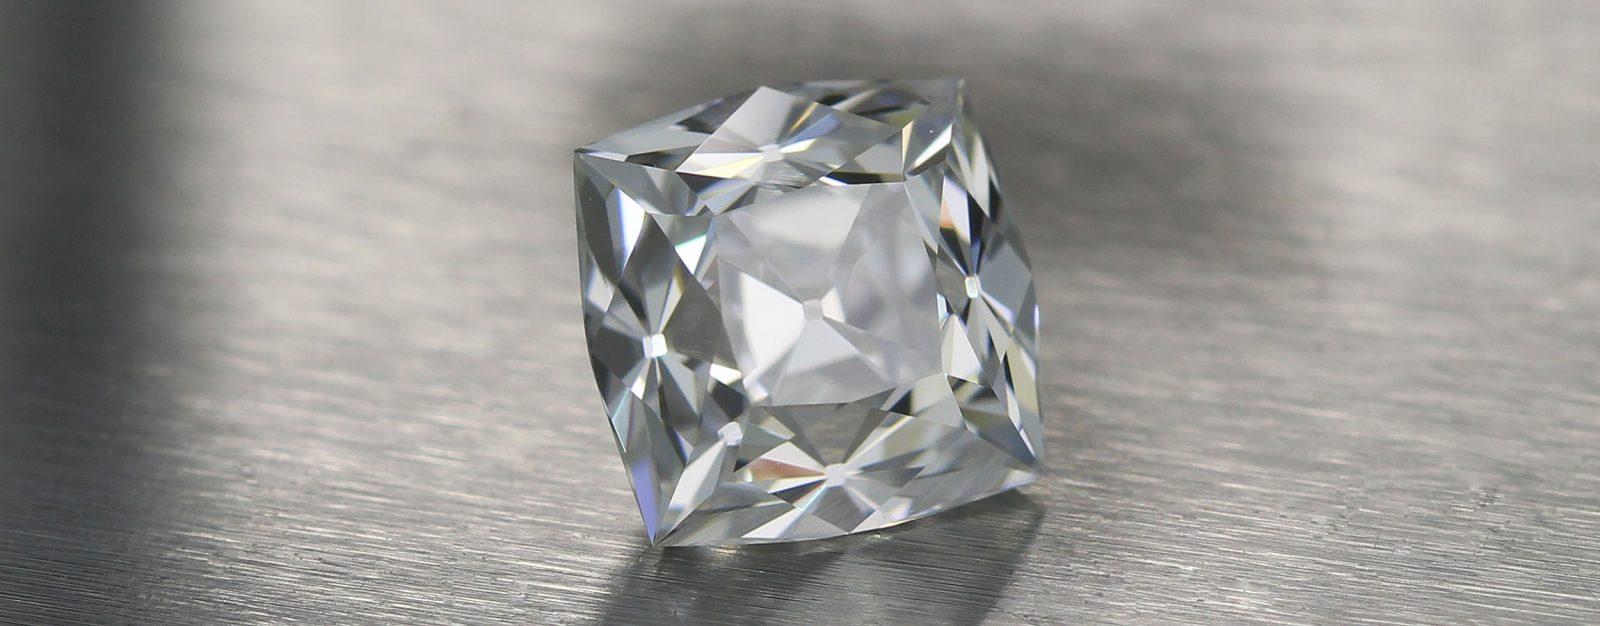 Three Stone Peruzzi Diamond™Layout - center Diamond